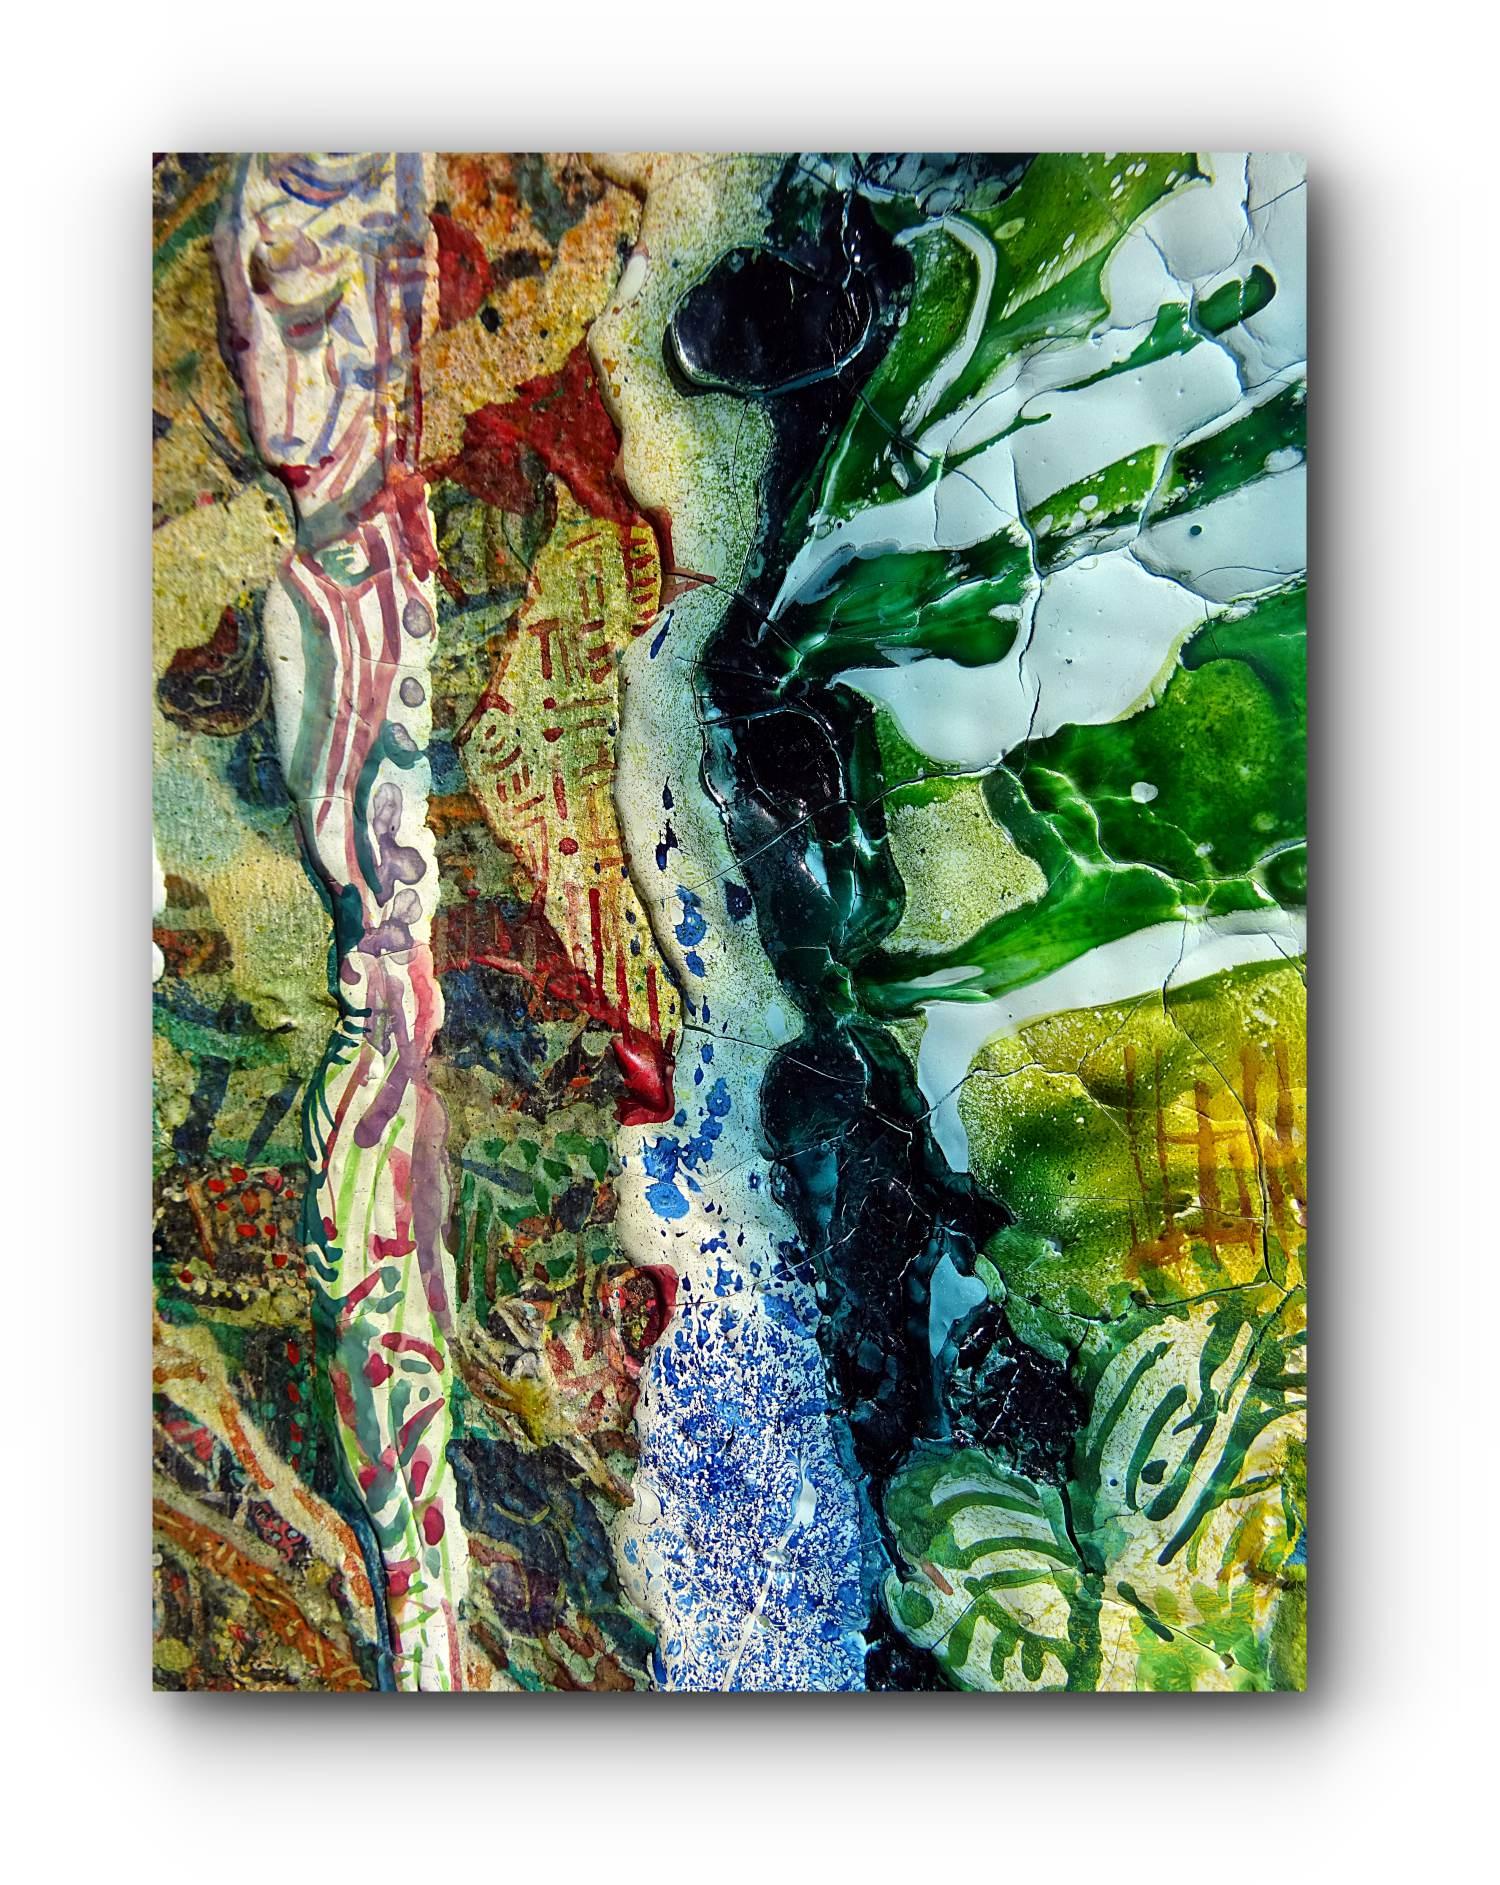 painting-detail-4-kiss-artist-duo-ingress-vortices.jpg